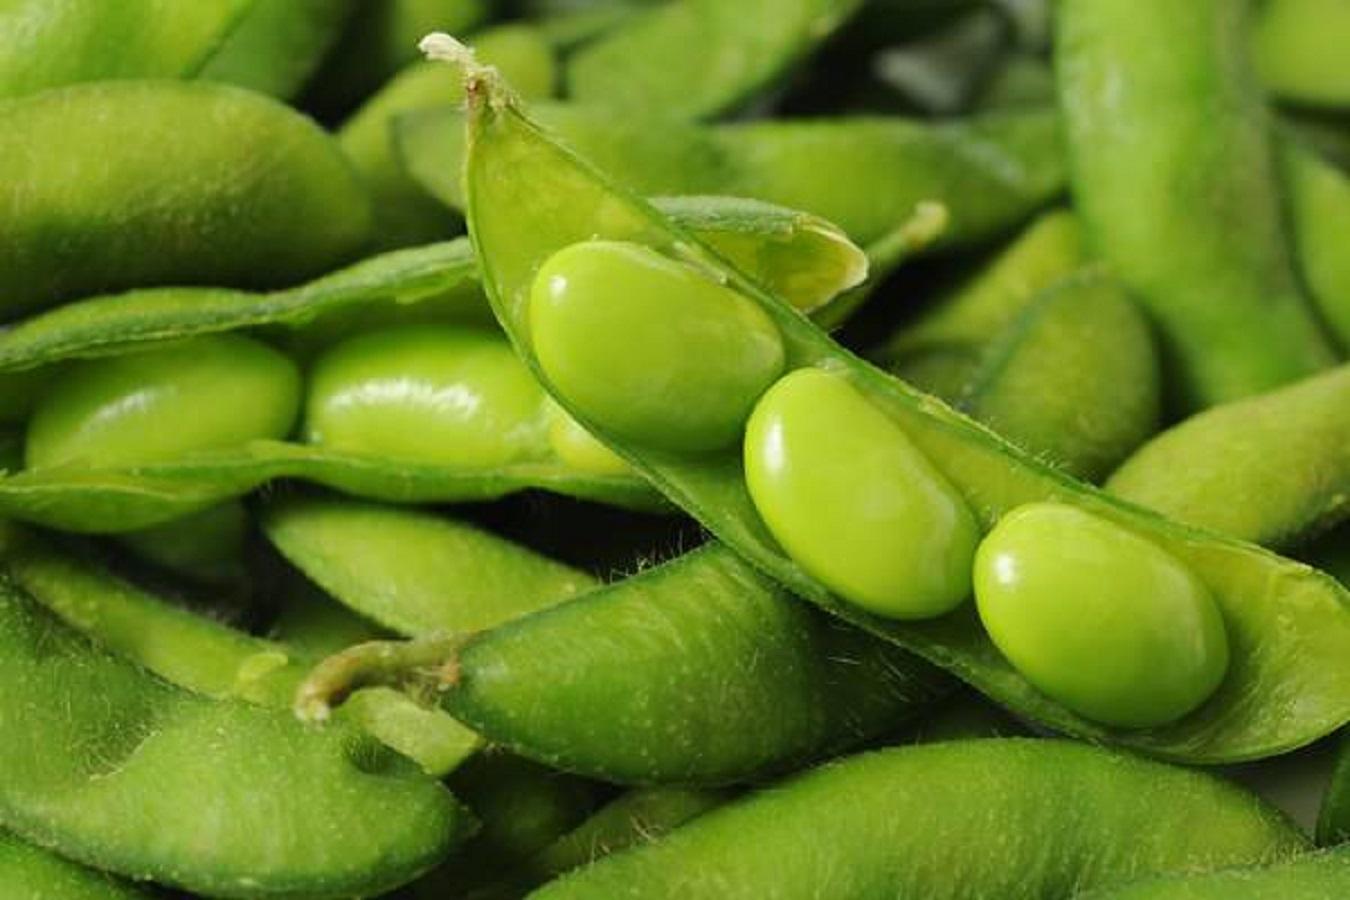 Dimagrire, 5 snack salutari alternativi per bruciare i grassi